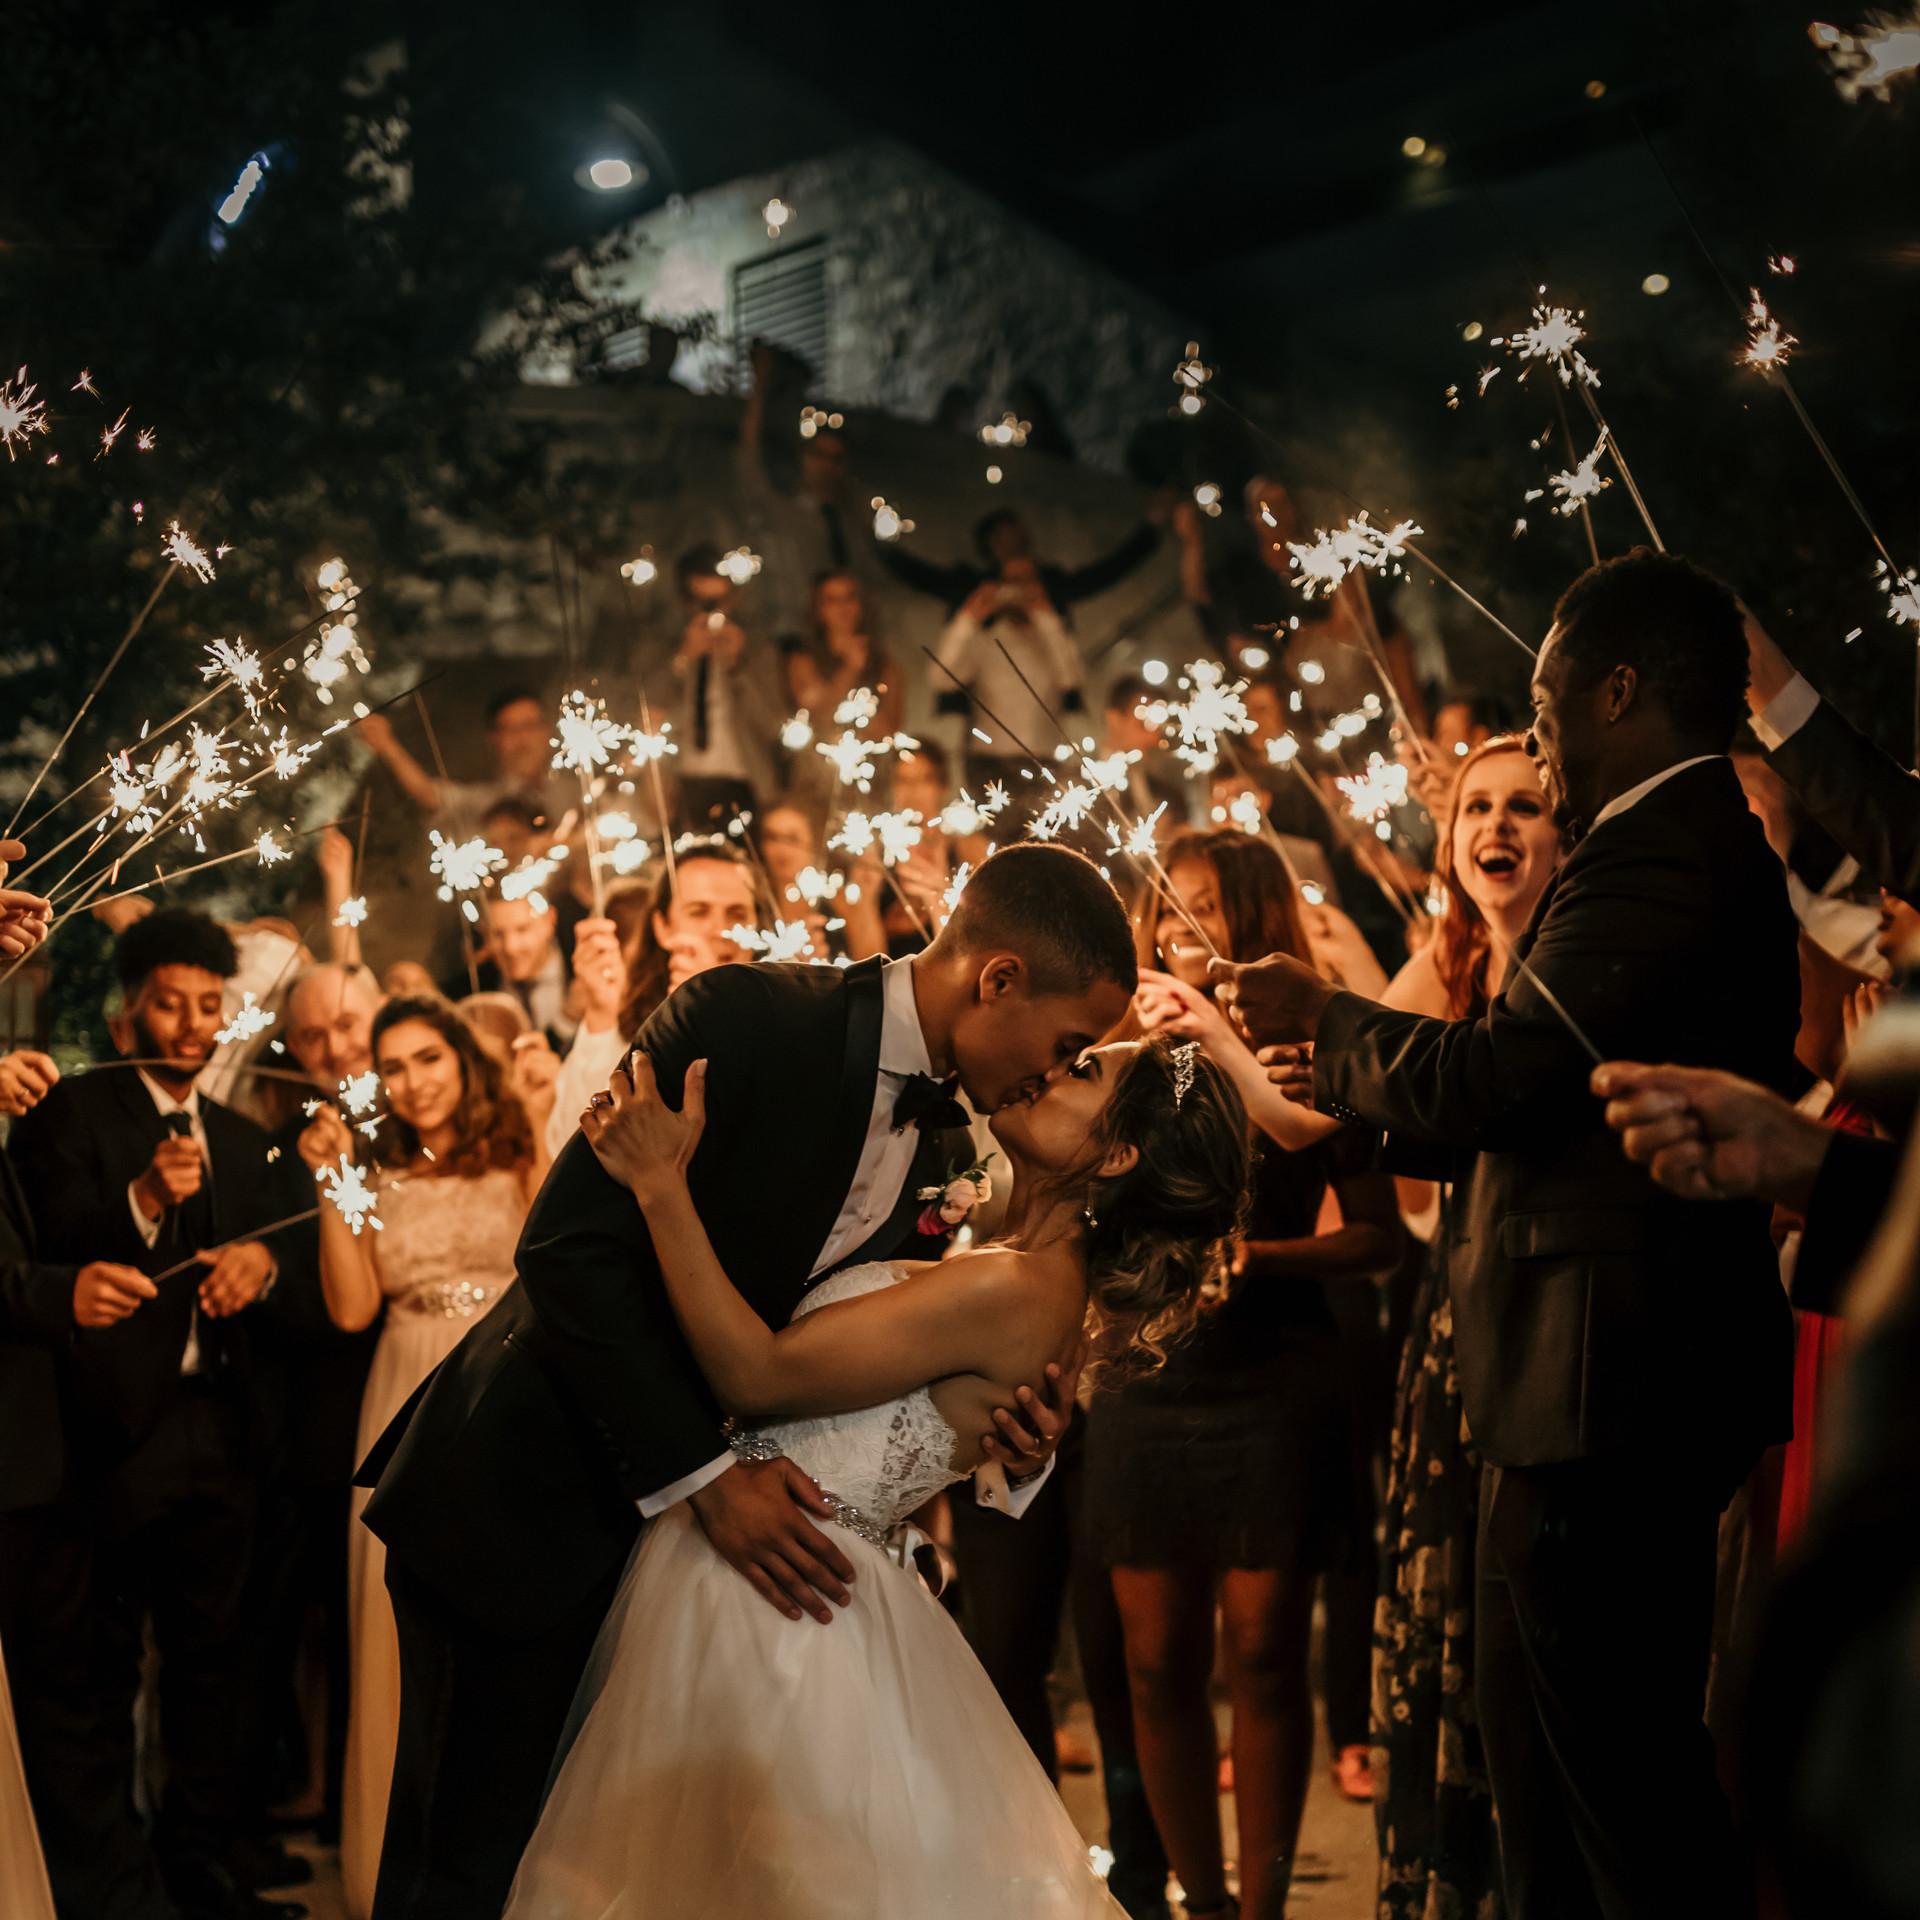 Rob-Anzit-Photography-Wedding-2019.jpg